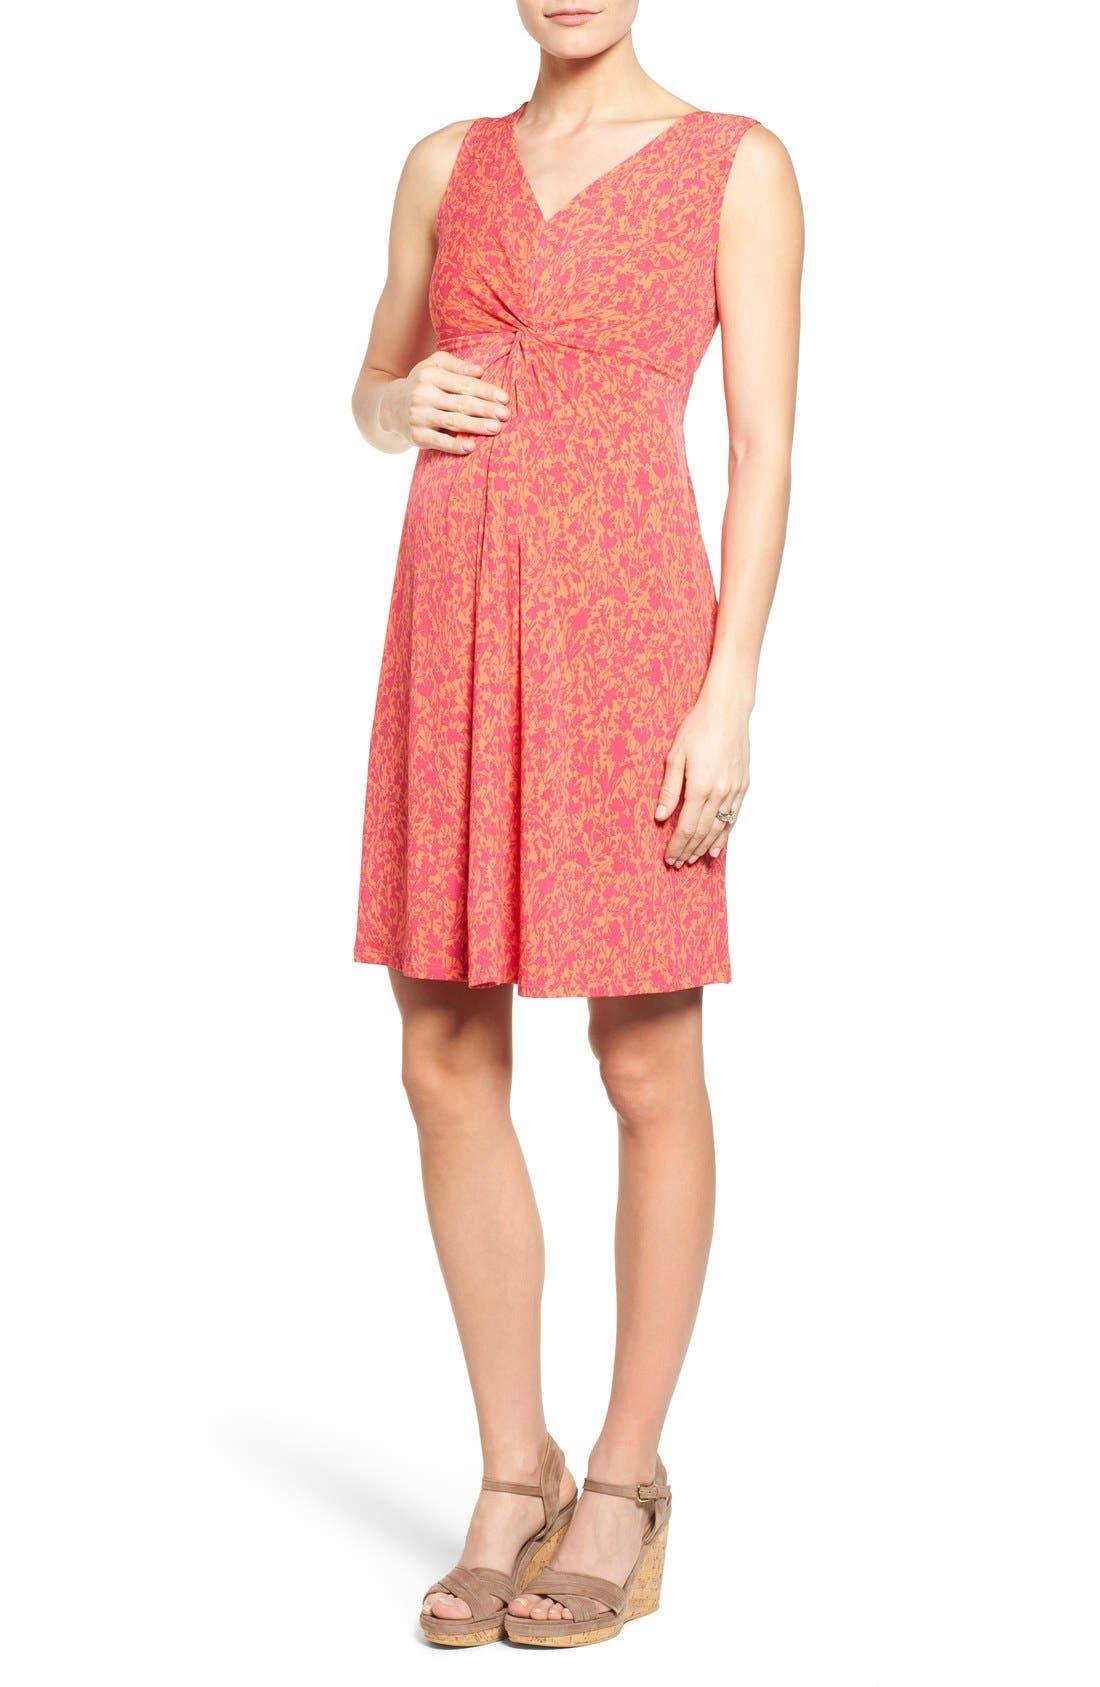 Leota Sleeveless Maternity Dress, Orange